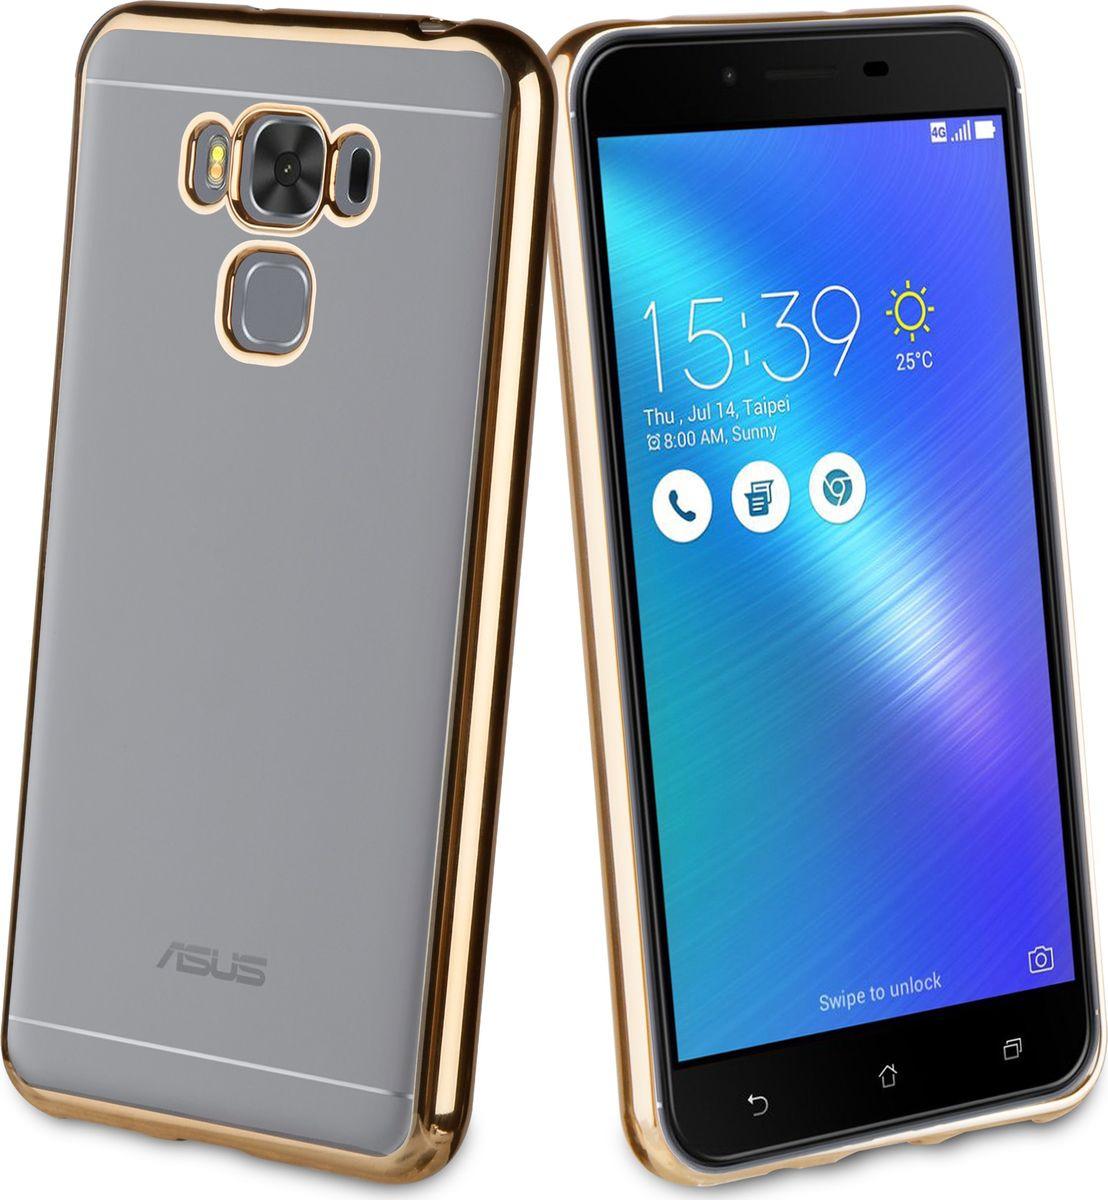 Чехол для сотового телефона Muvit Bling Case для ASUS Zenfone 3 Max (ZC553KL), MLBKC0181, золотой zc553kl 4h112ru